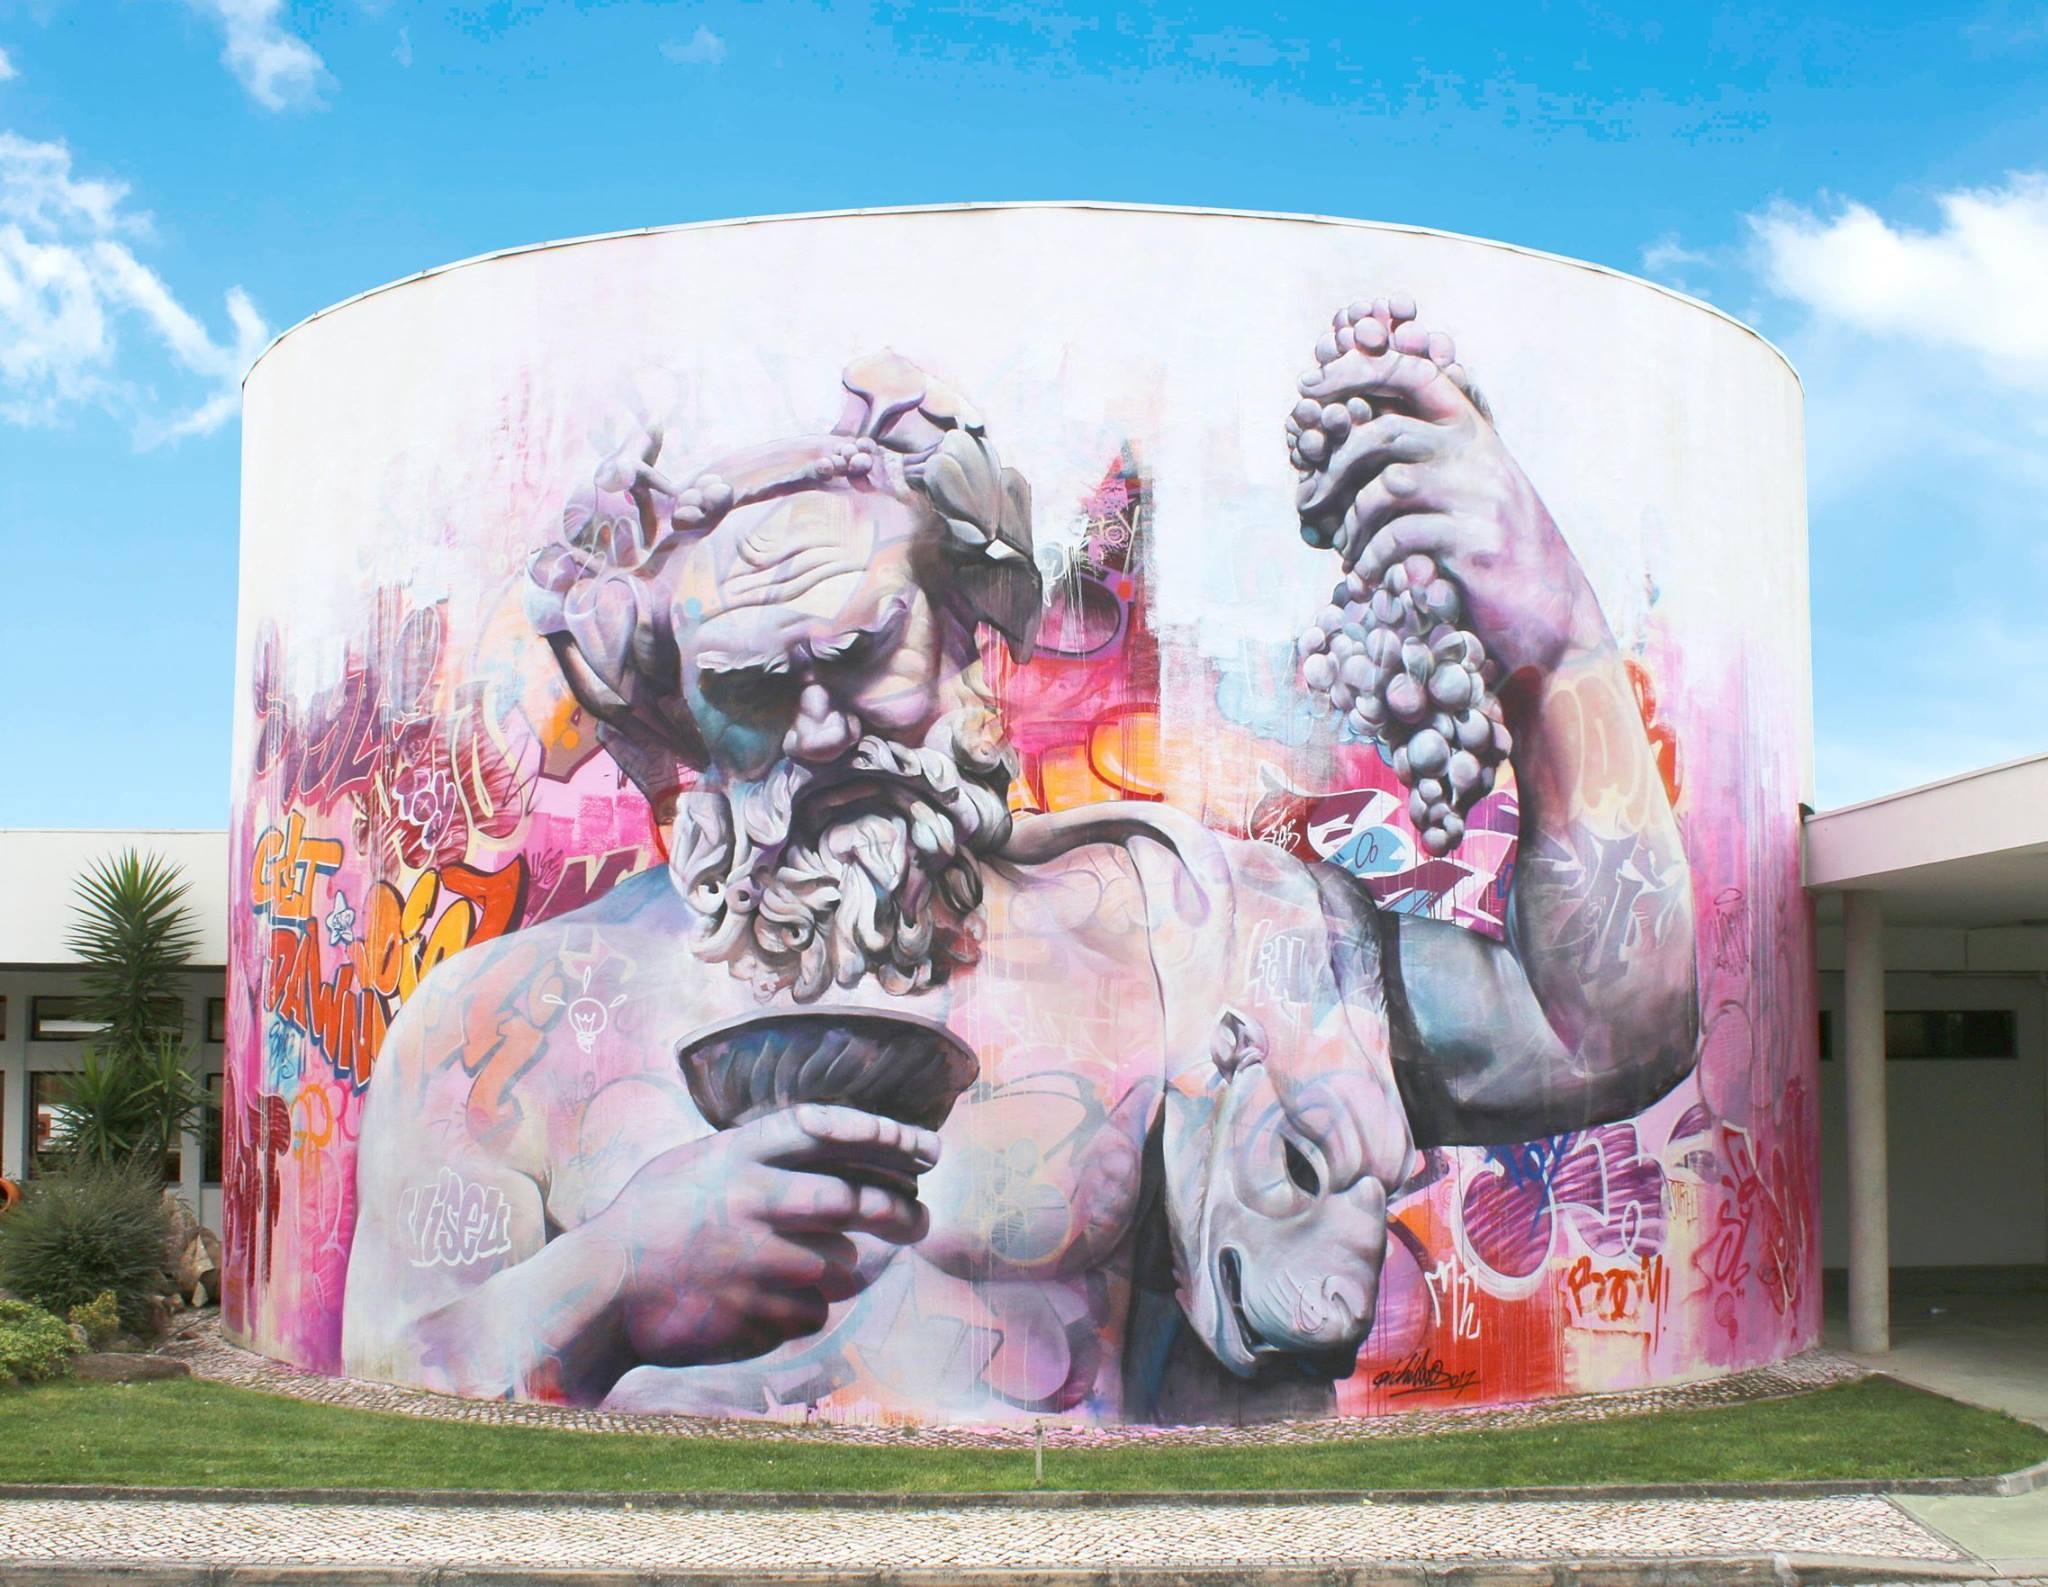 Mythologische en historische wezens in PichiAvo-graffiti. Foto: PichiAvo